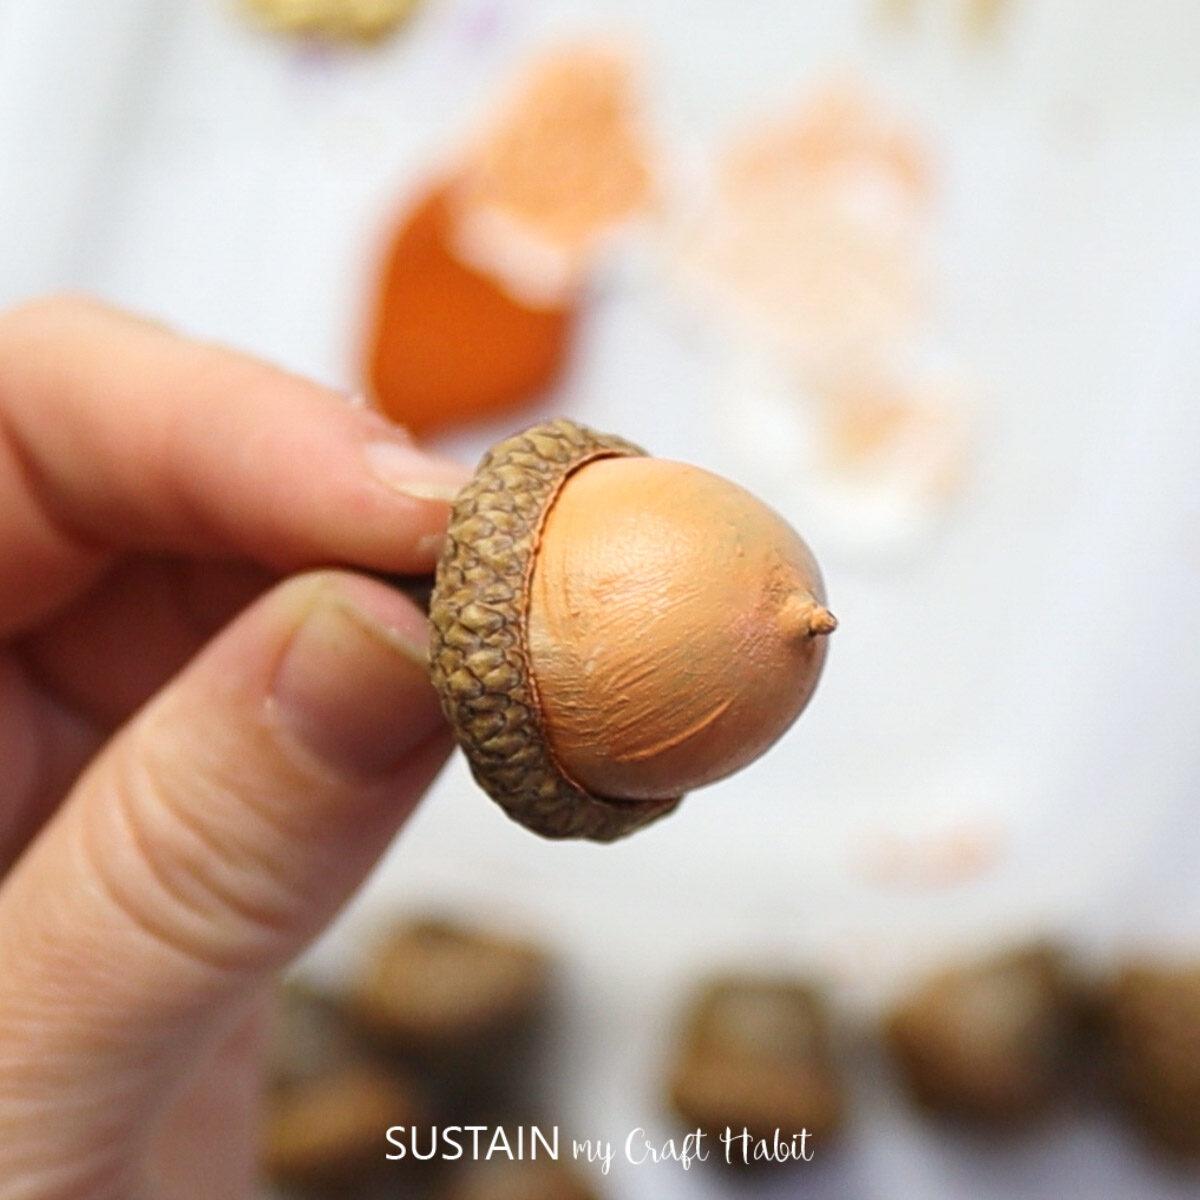 Painting half an acorn light orange.